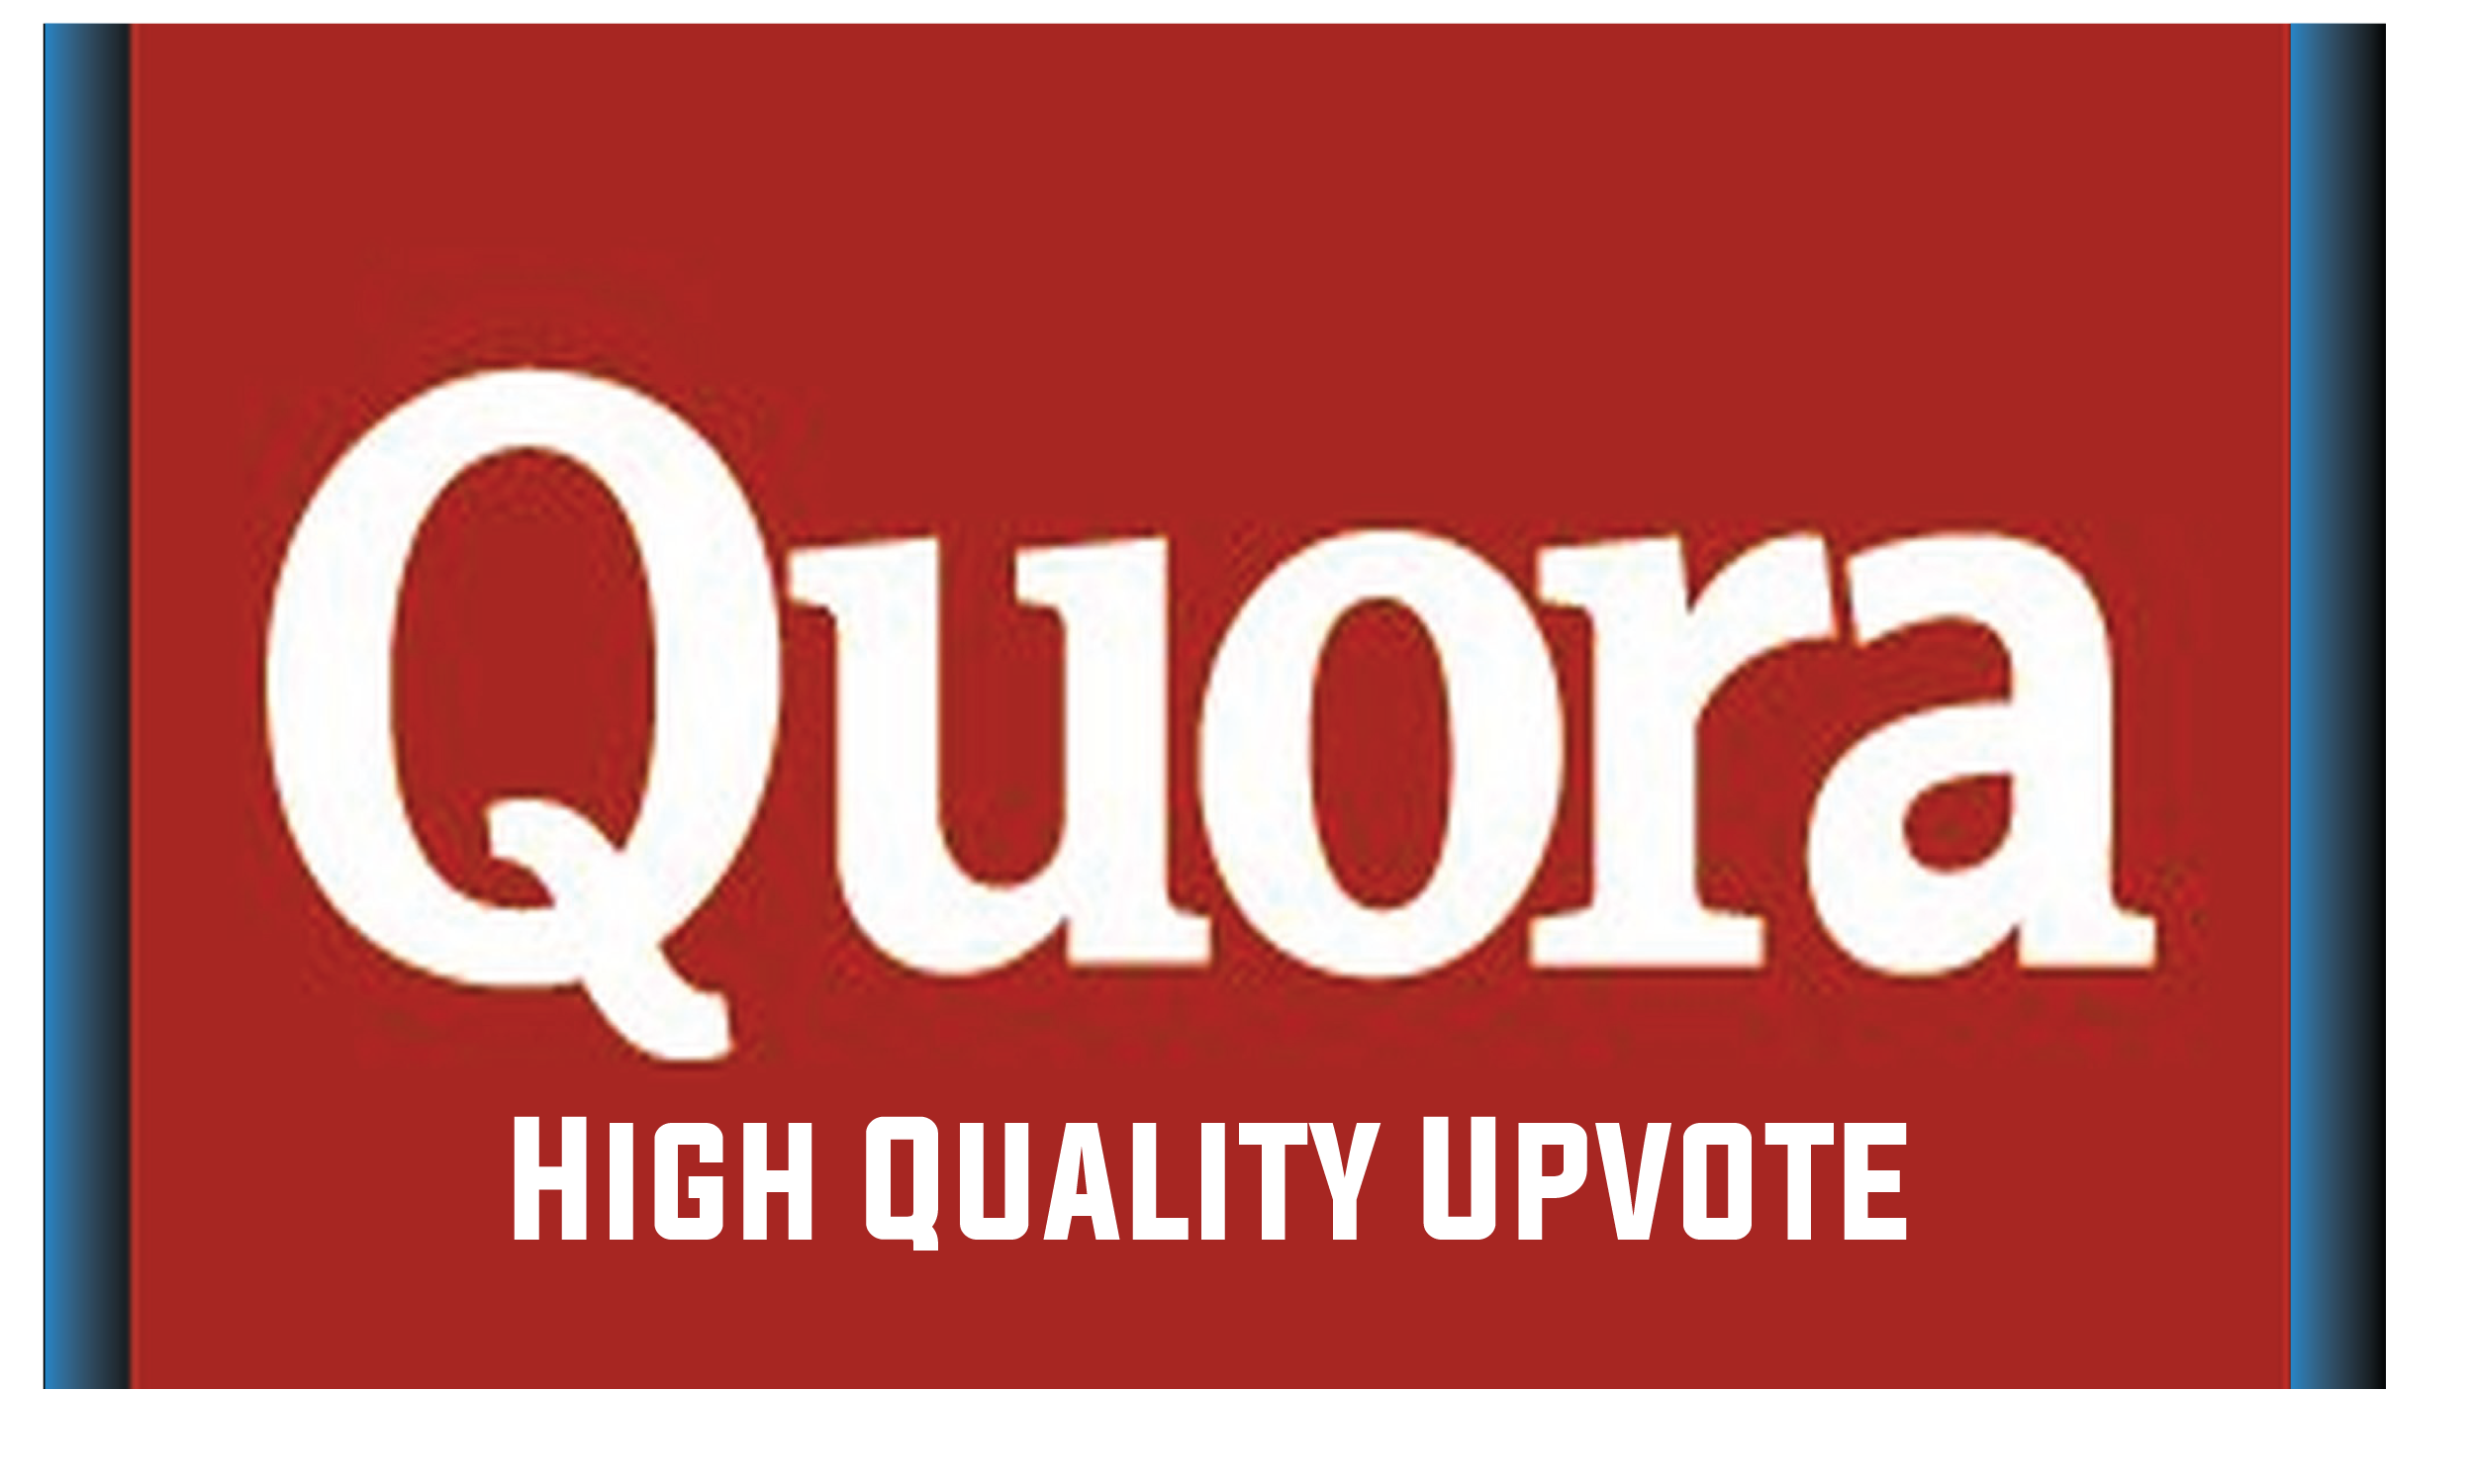 30+ Worldwide Quora Upvotes in very short Time